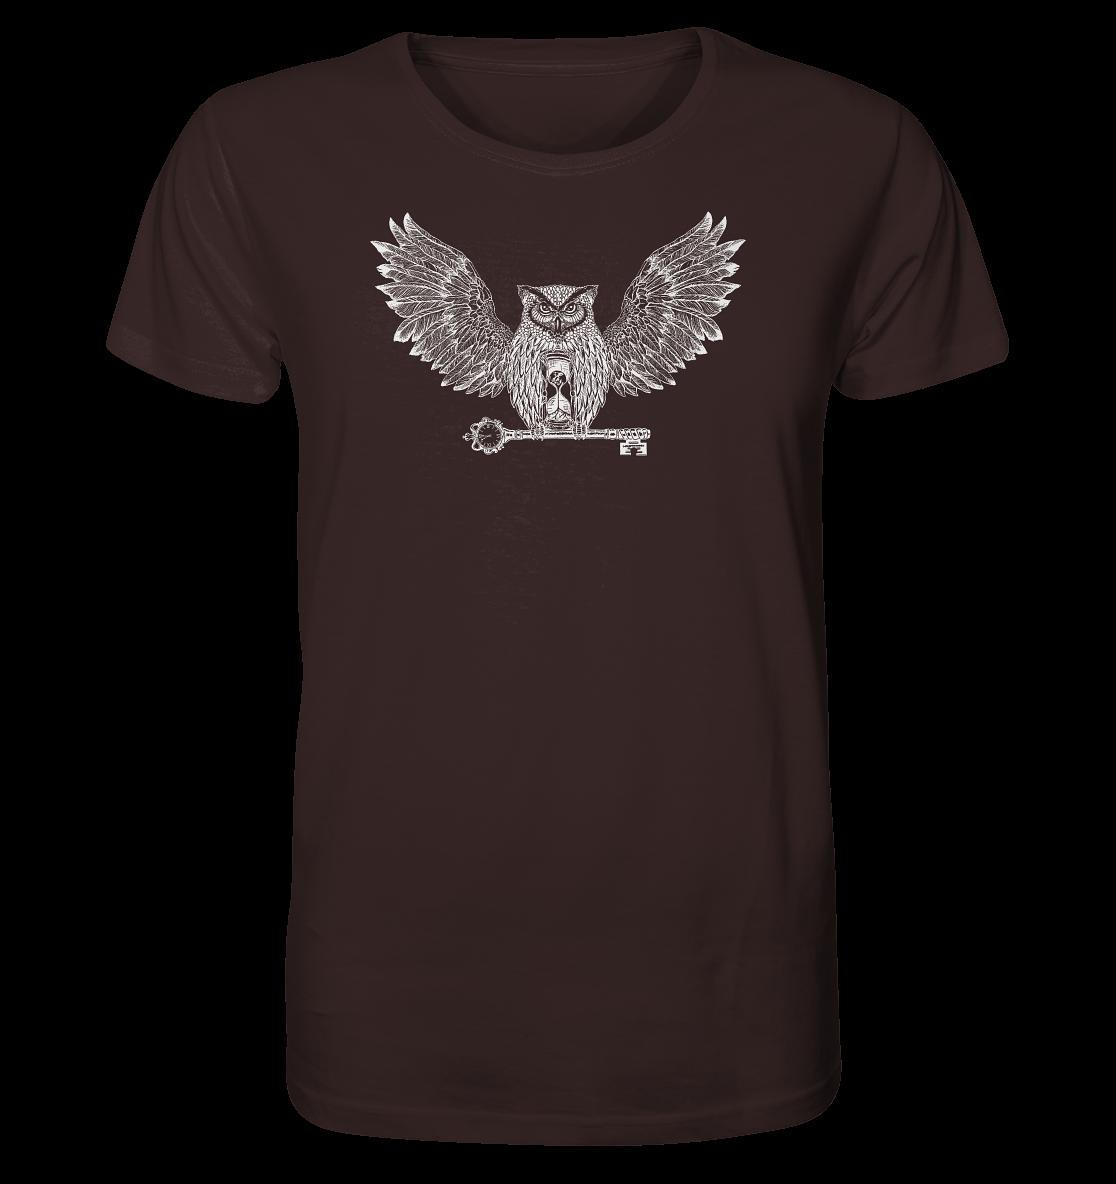 front-organic-shirt-372726-1116x-4.png